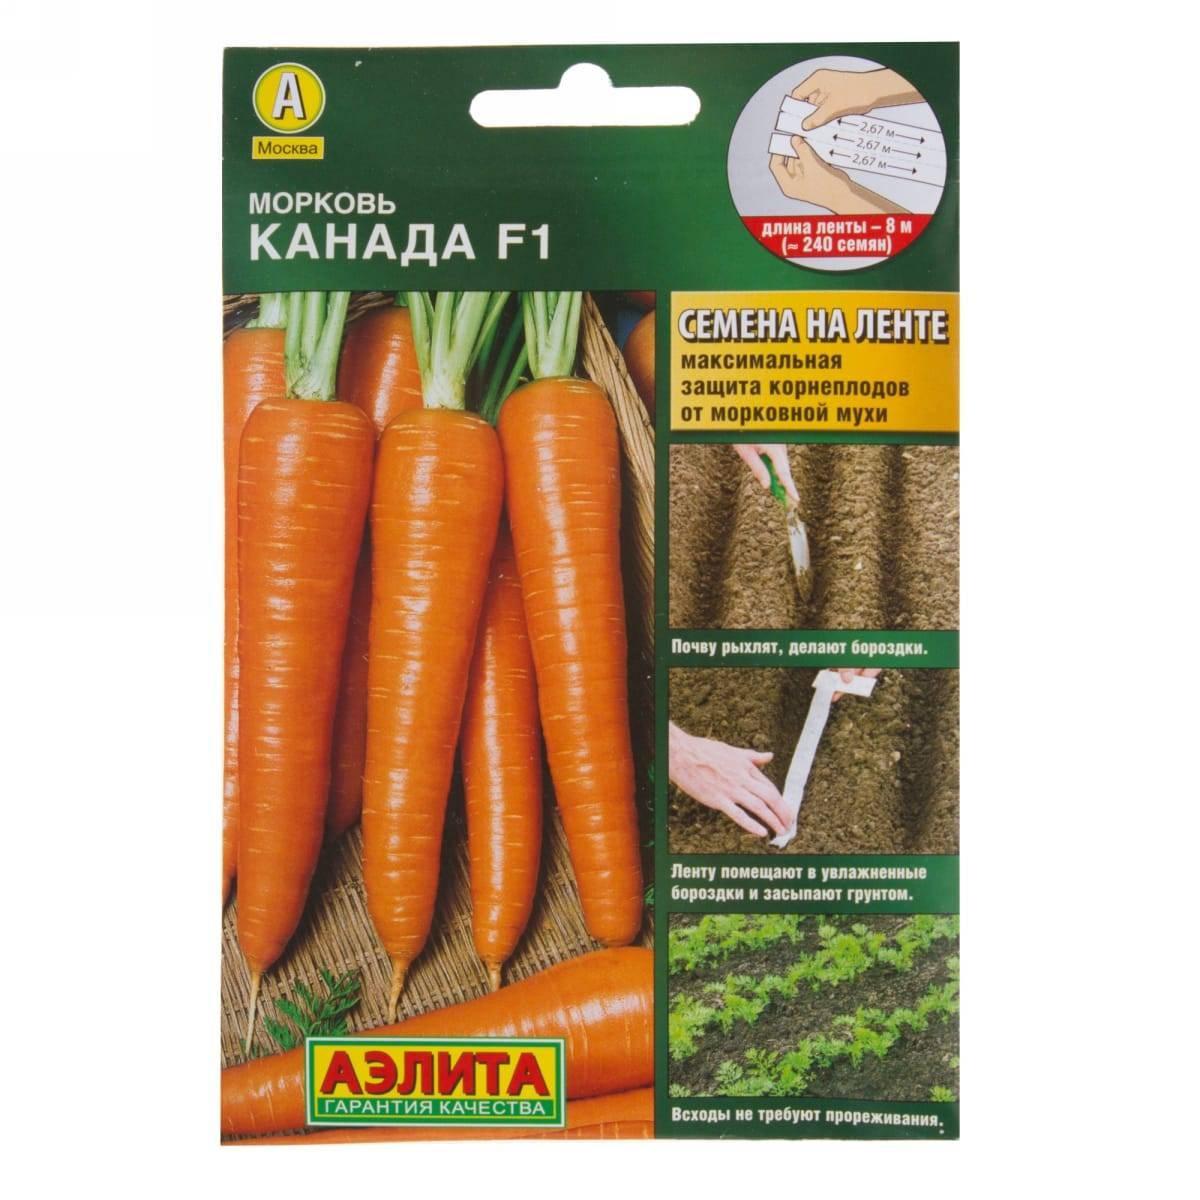 Морковь сорта канада f1: овощ для тяжелого грунта. описание и характеристика